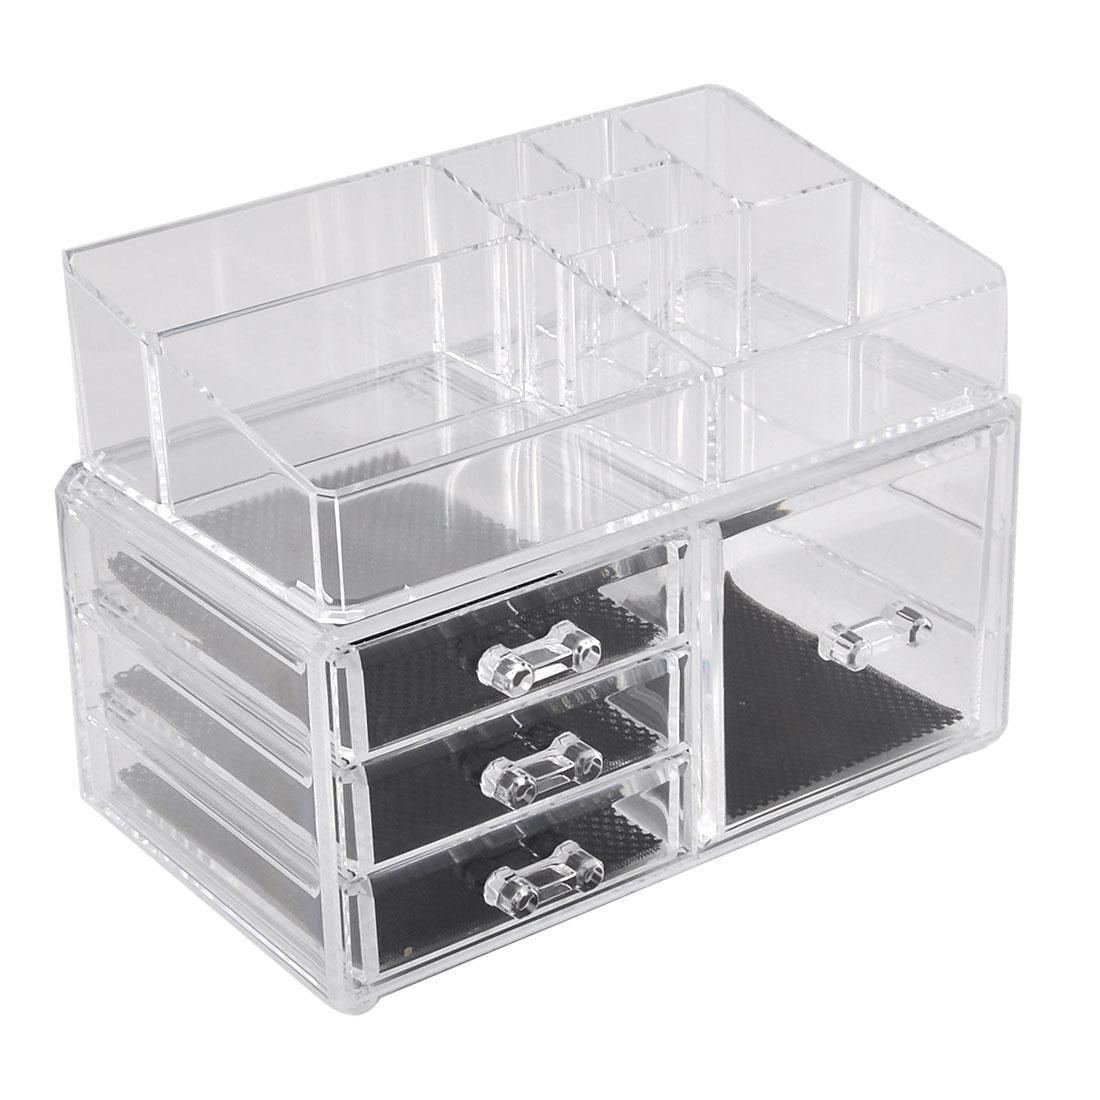 Bathroom Dresser Acrylic Makeup Tool Storage Case Display Box Jewelry Organizer Set 2 in 1